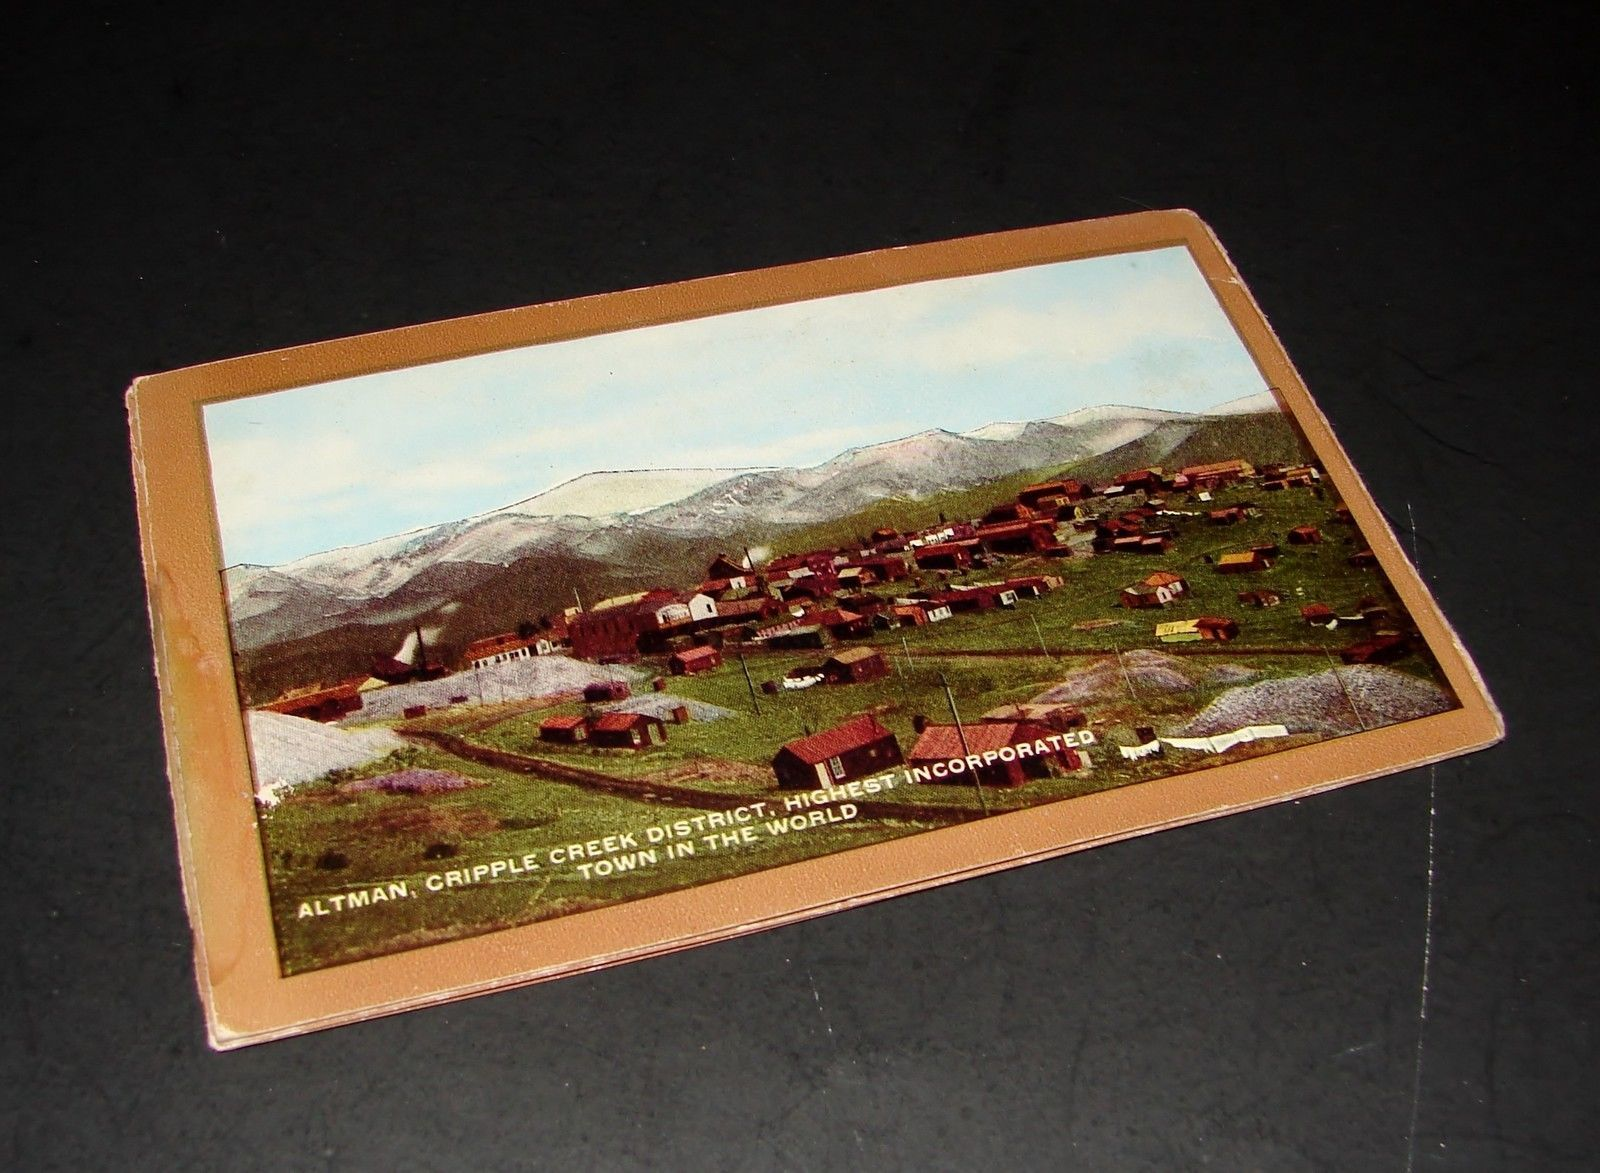 1916 Antique POSTCARD FOLDER Cripple Creek Short Line Railroad Train Colorado